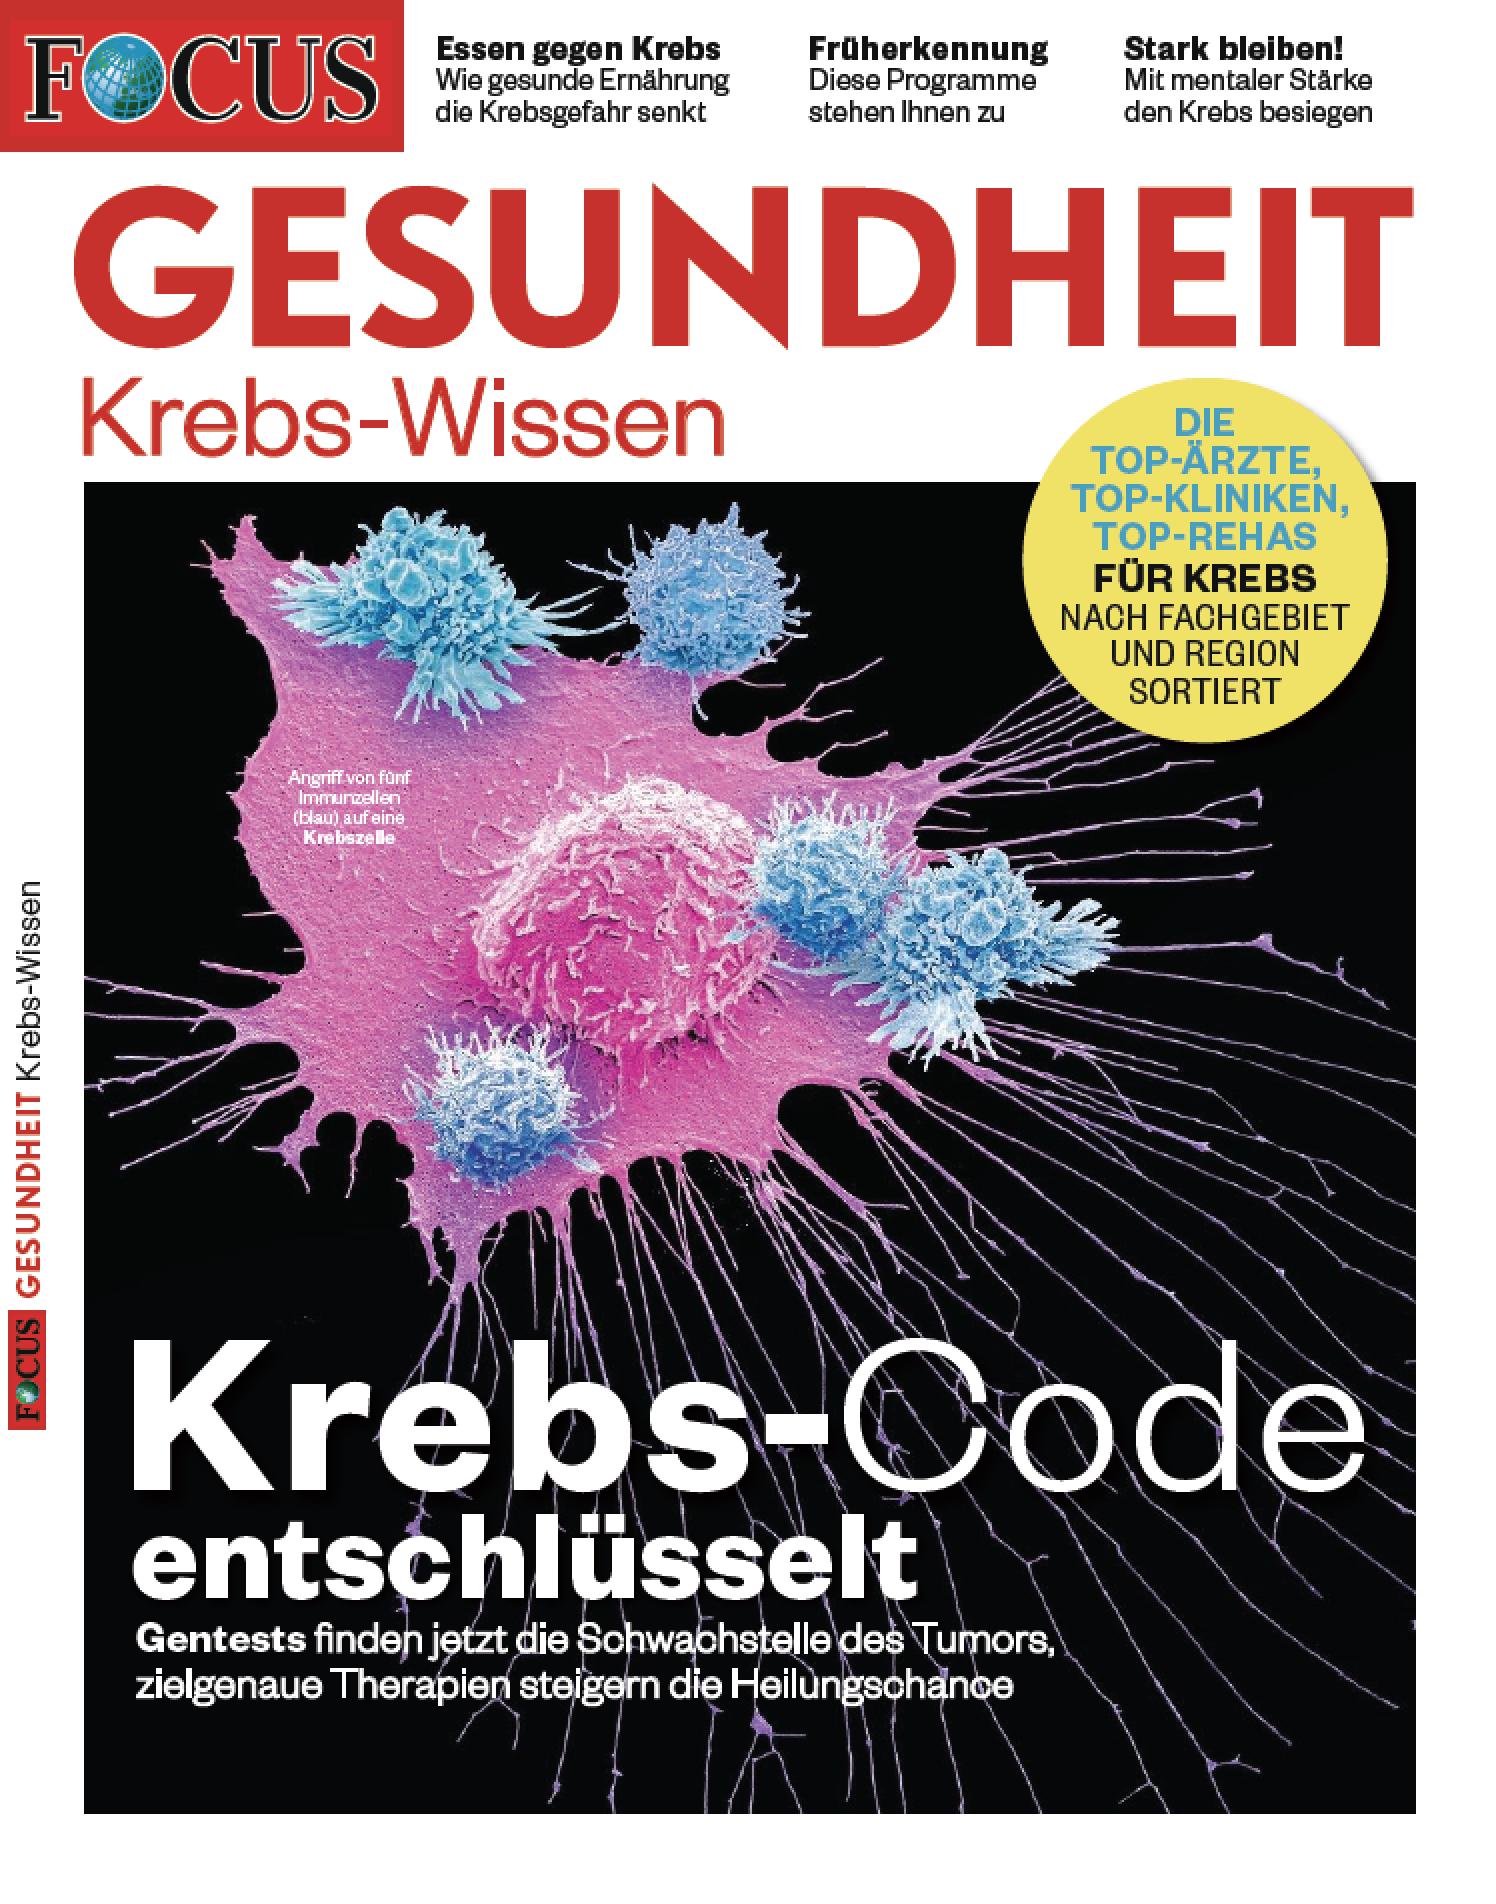 FOCUS-GESUNDHEIT FOCUS GESUNDHEIT - Krebs 2019